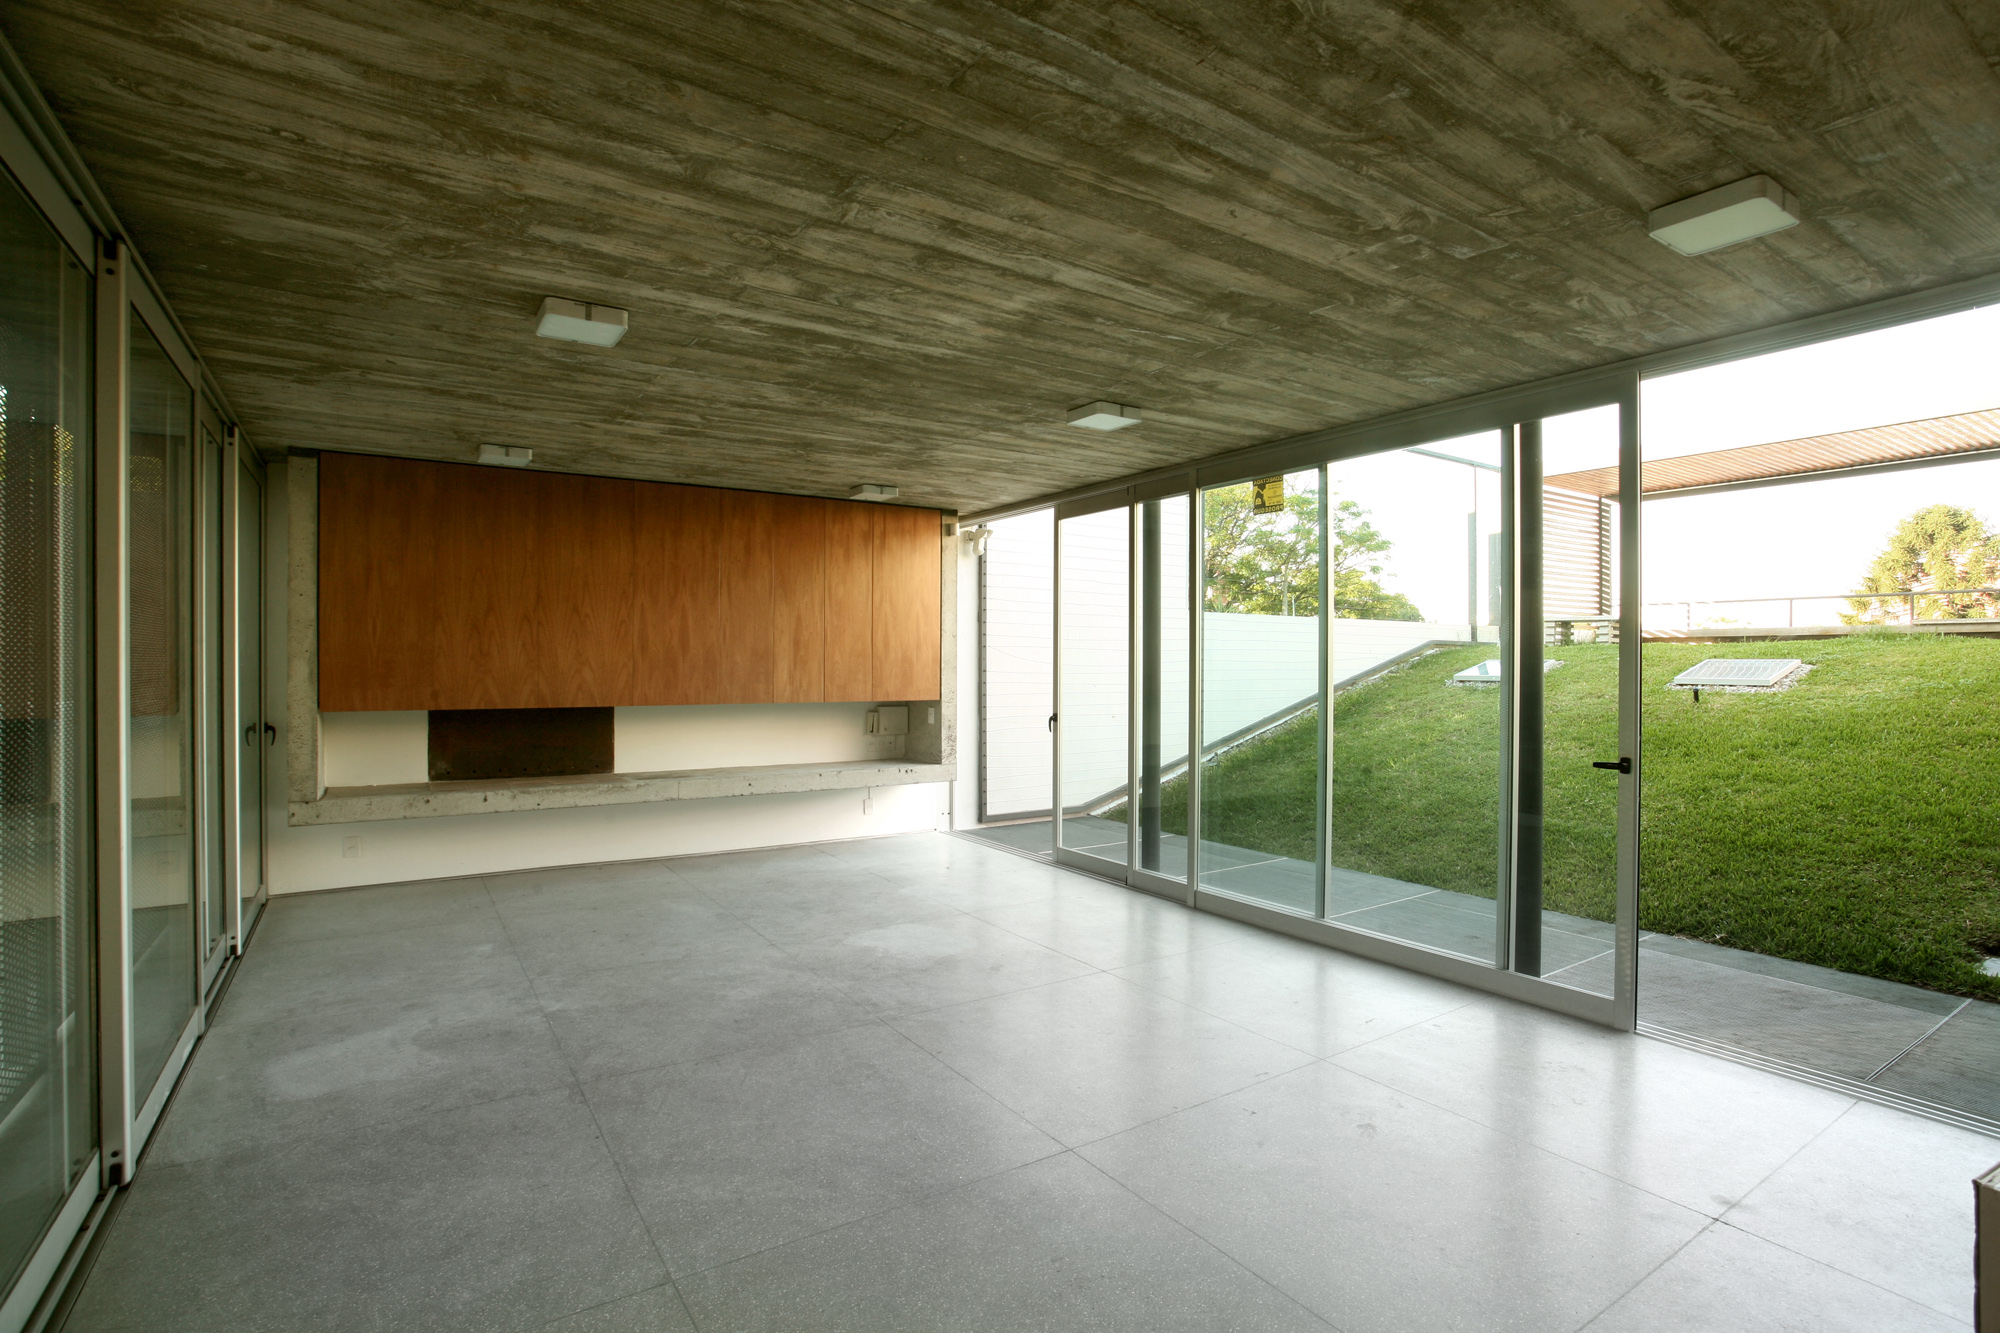 Cubierta Verde - Cardoso + Zúñiga, arquitectura, casas